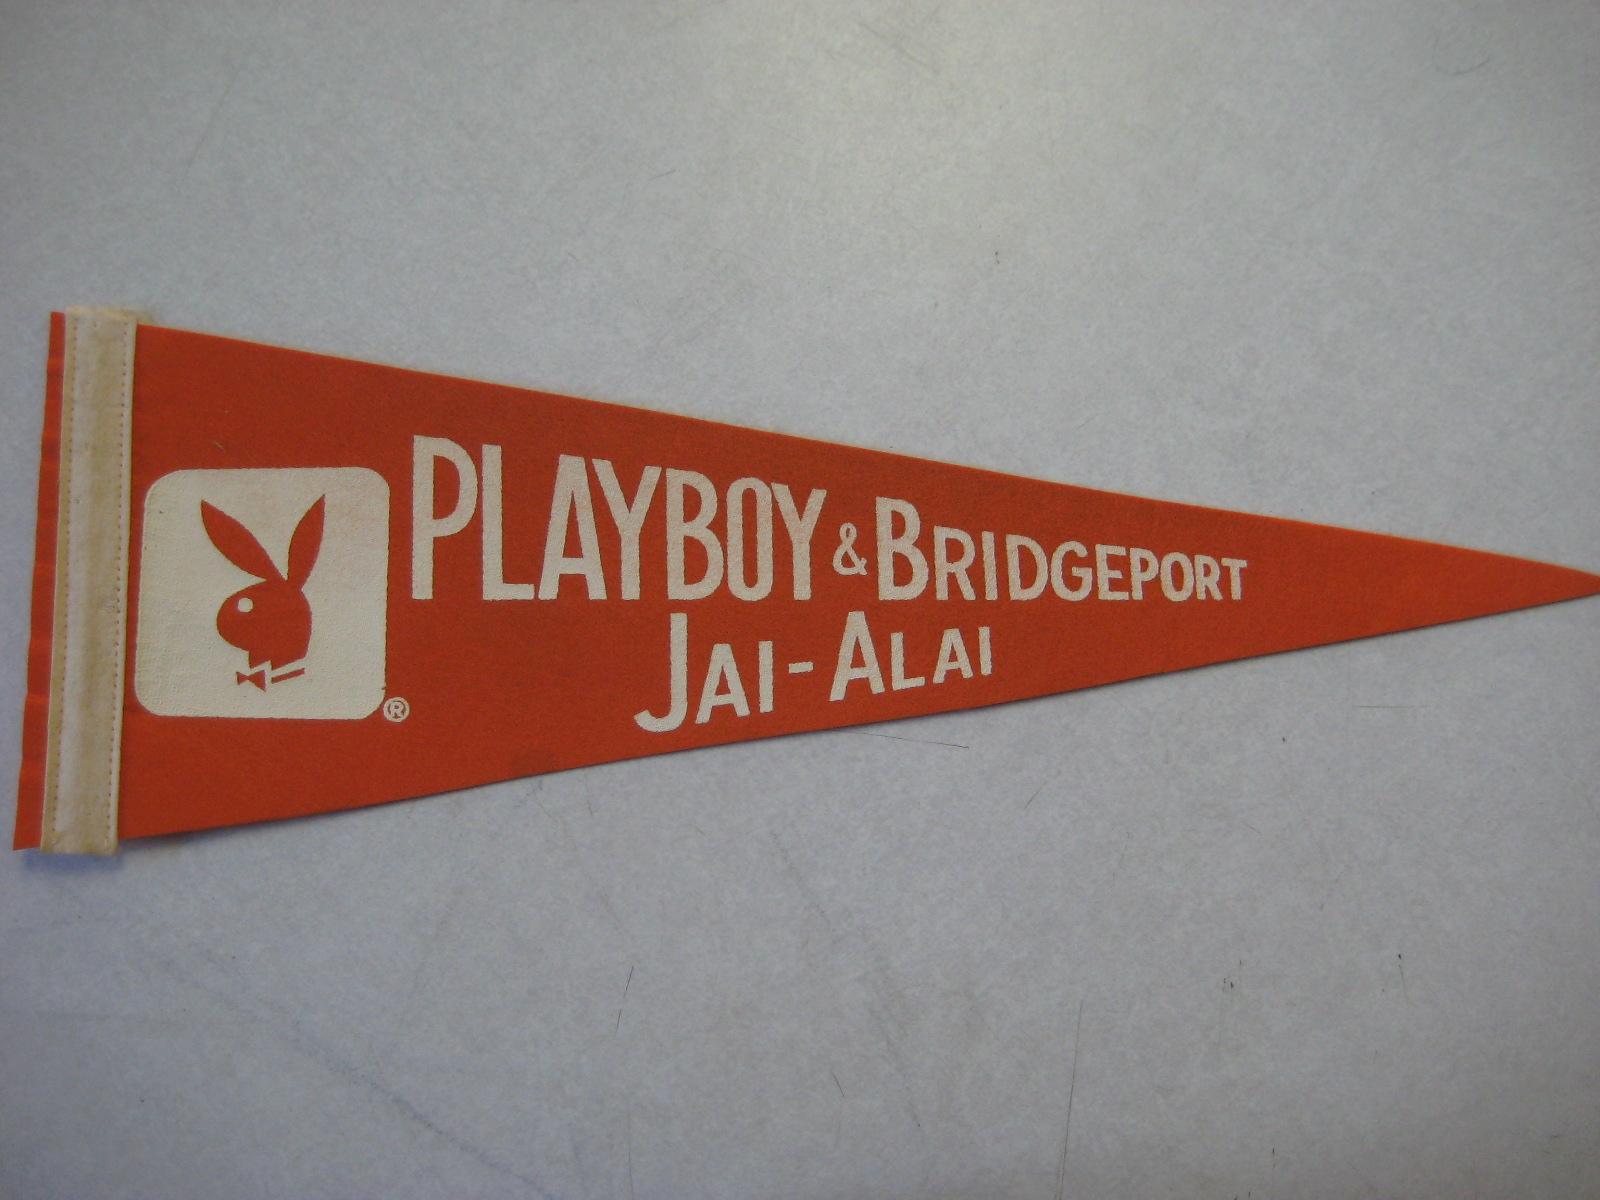 Playboy Jai-Alai Bridgeport Connecticut